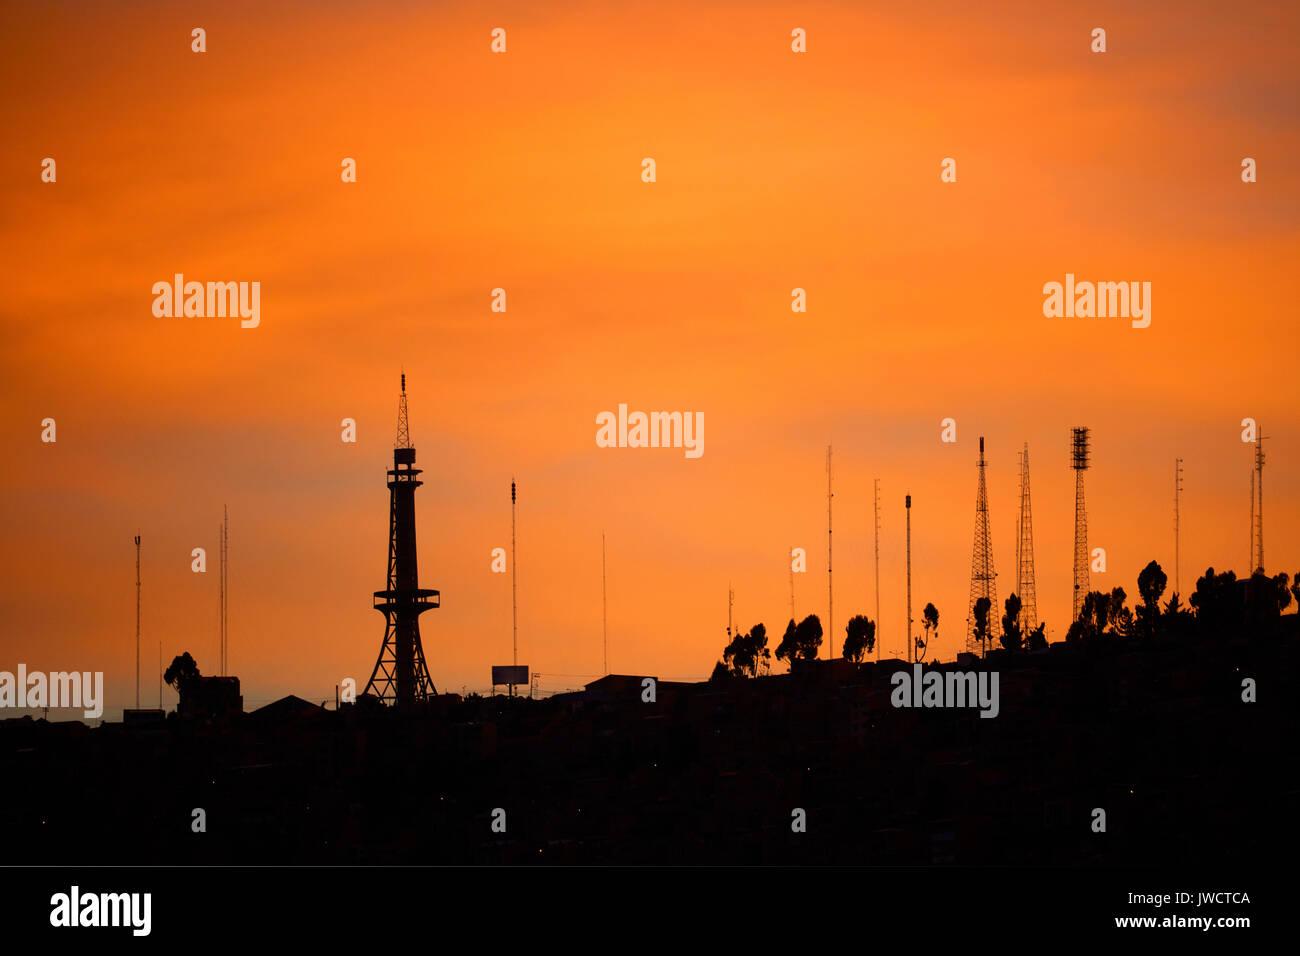 Sunset and aerials, La Paz, Bolivia, South America - Stock Image